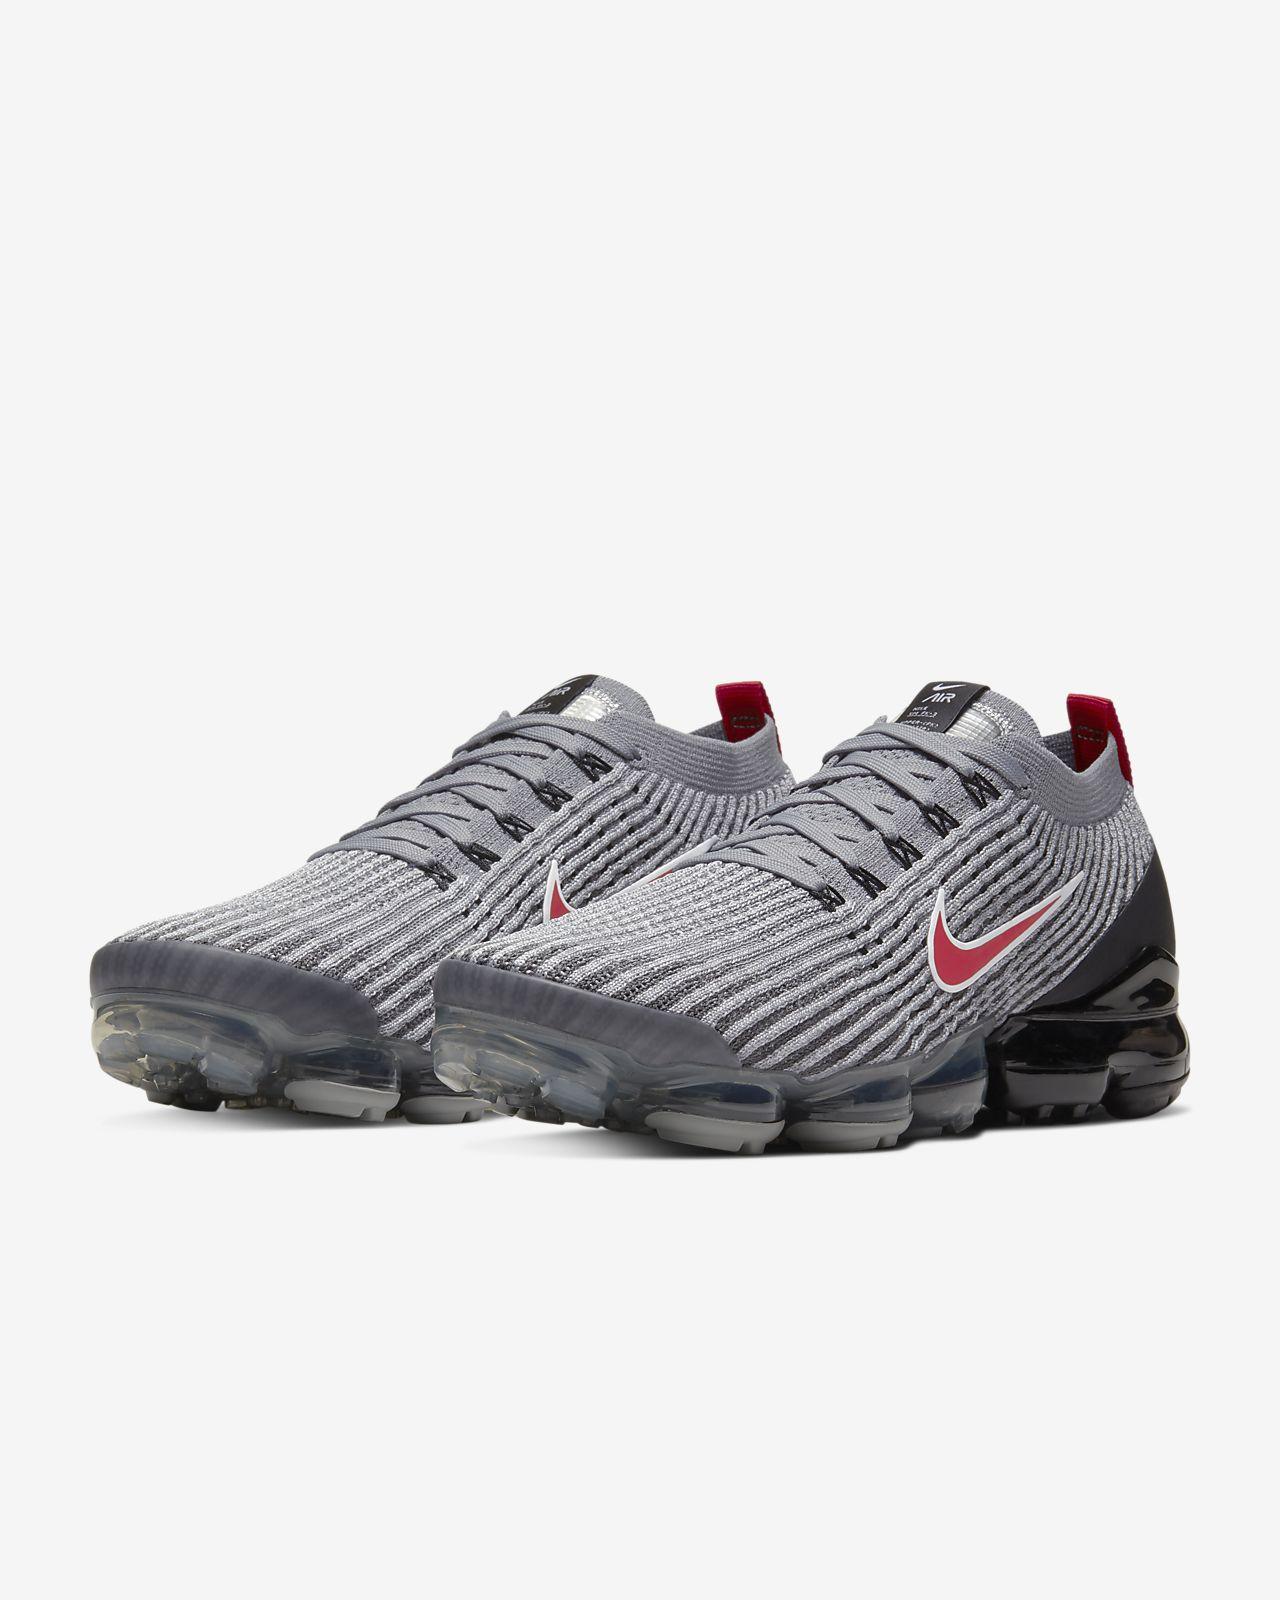 nike air vapormax flyknit 3 men's shoe white